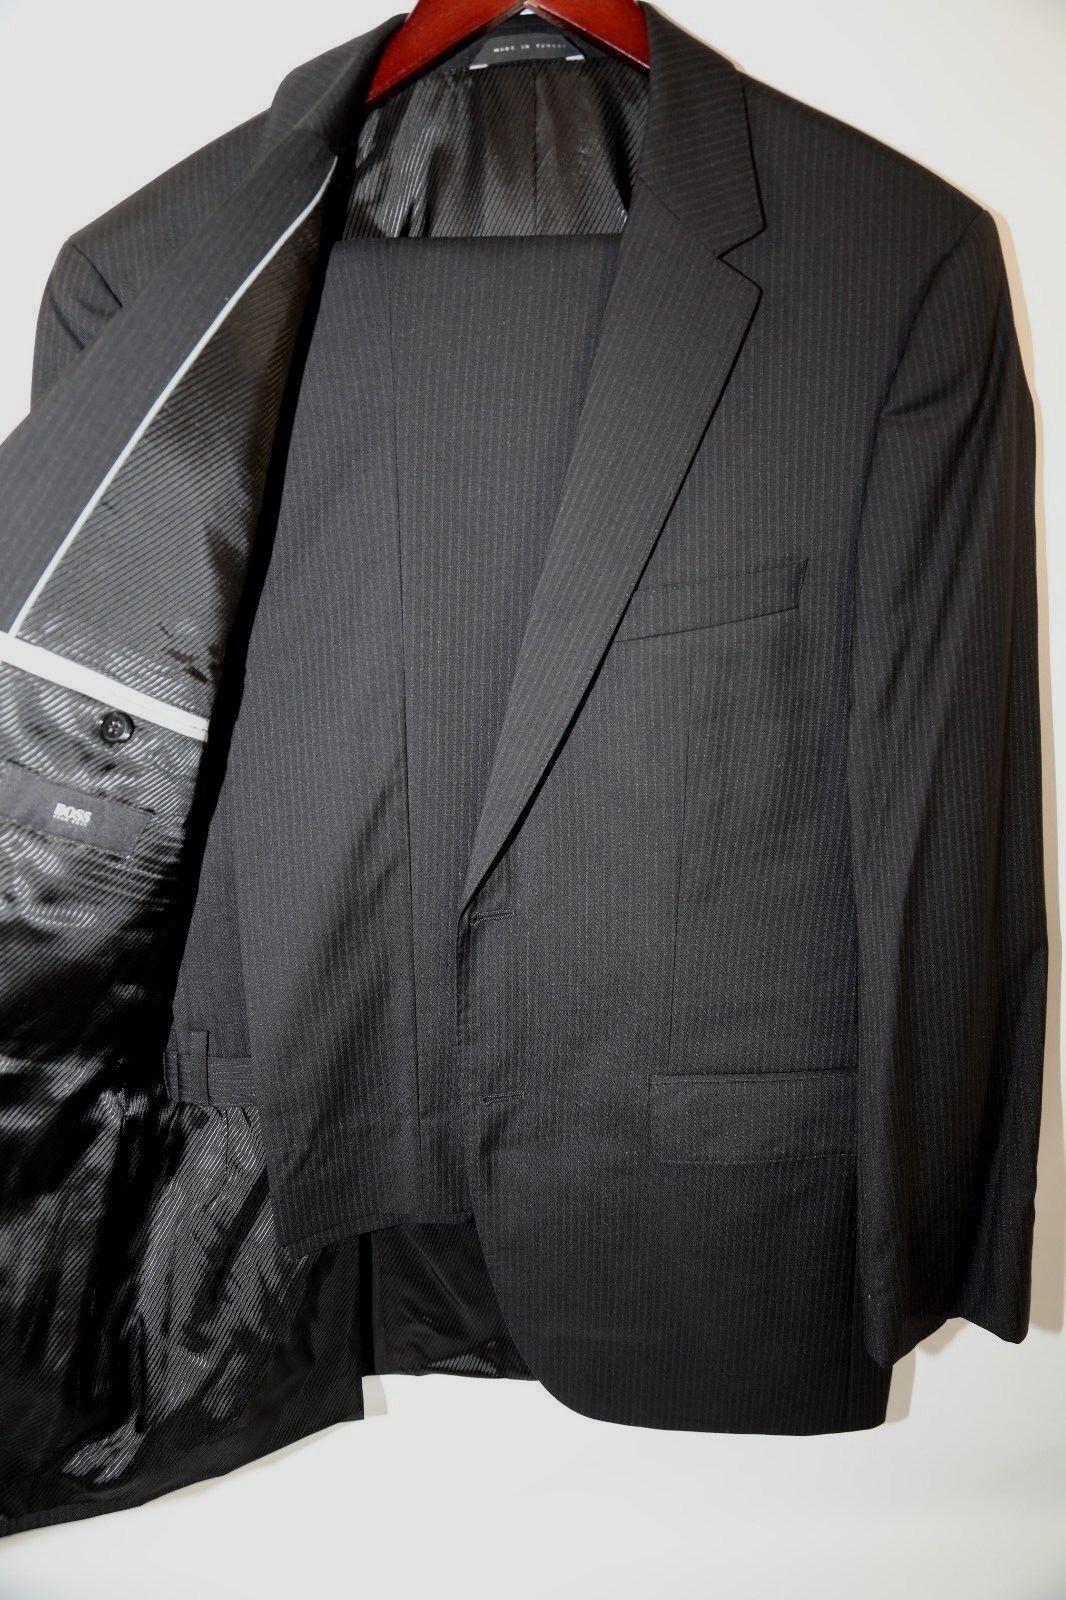 175  HUGO BOSS The James3/Sharp5  Striped Suit Größe 38 R